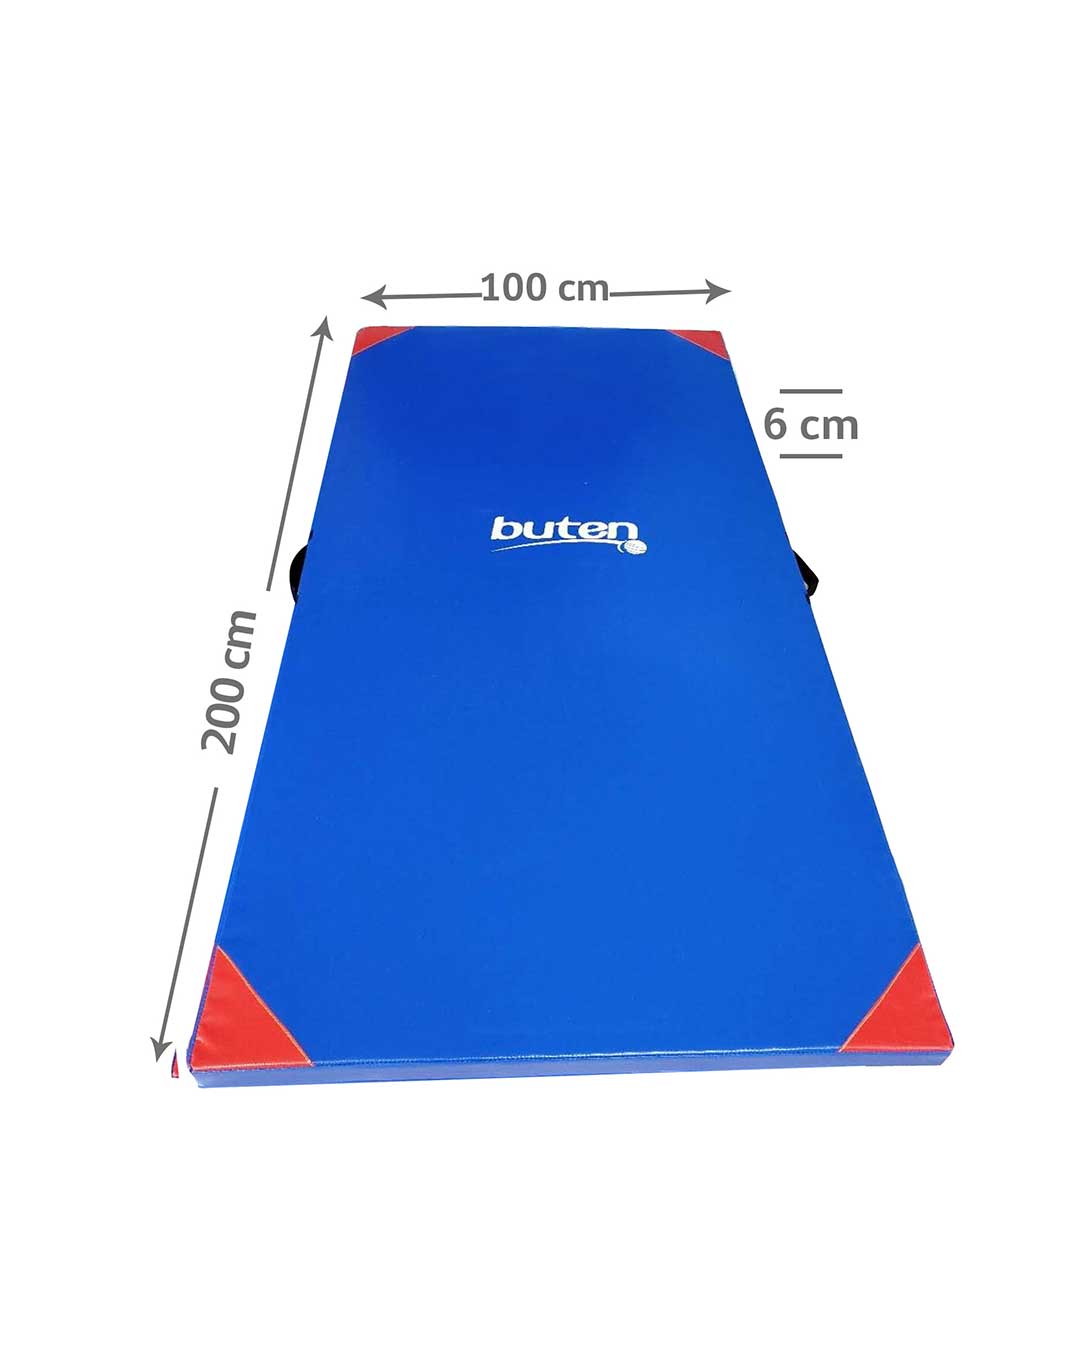 Colchoneta para ejercicio (200x100x6cm) marca BUTEN - PVC